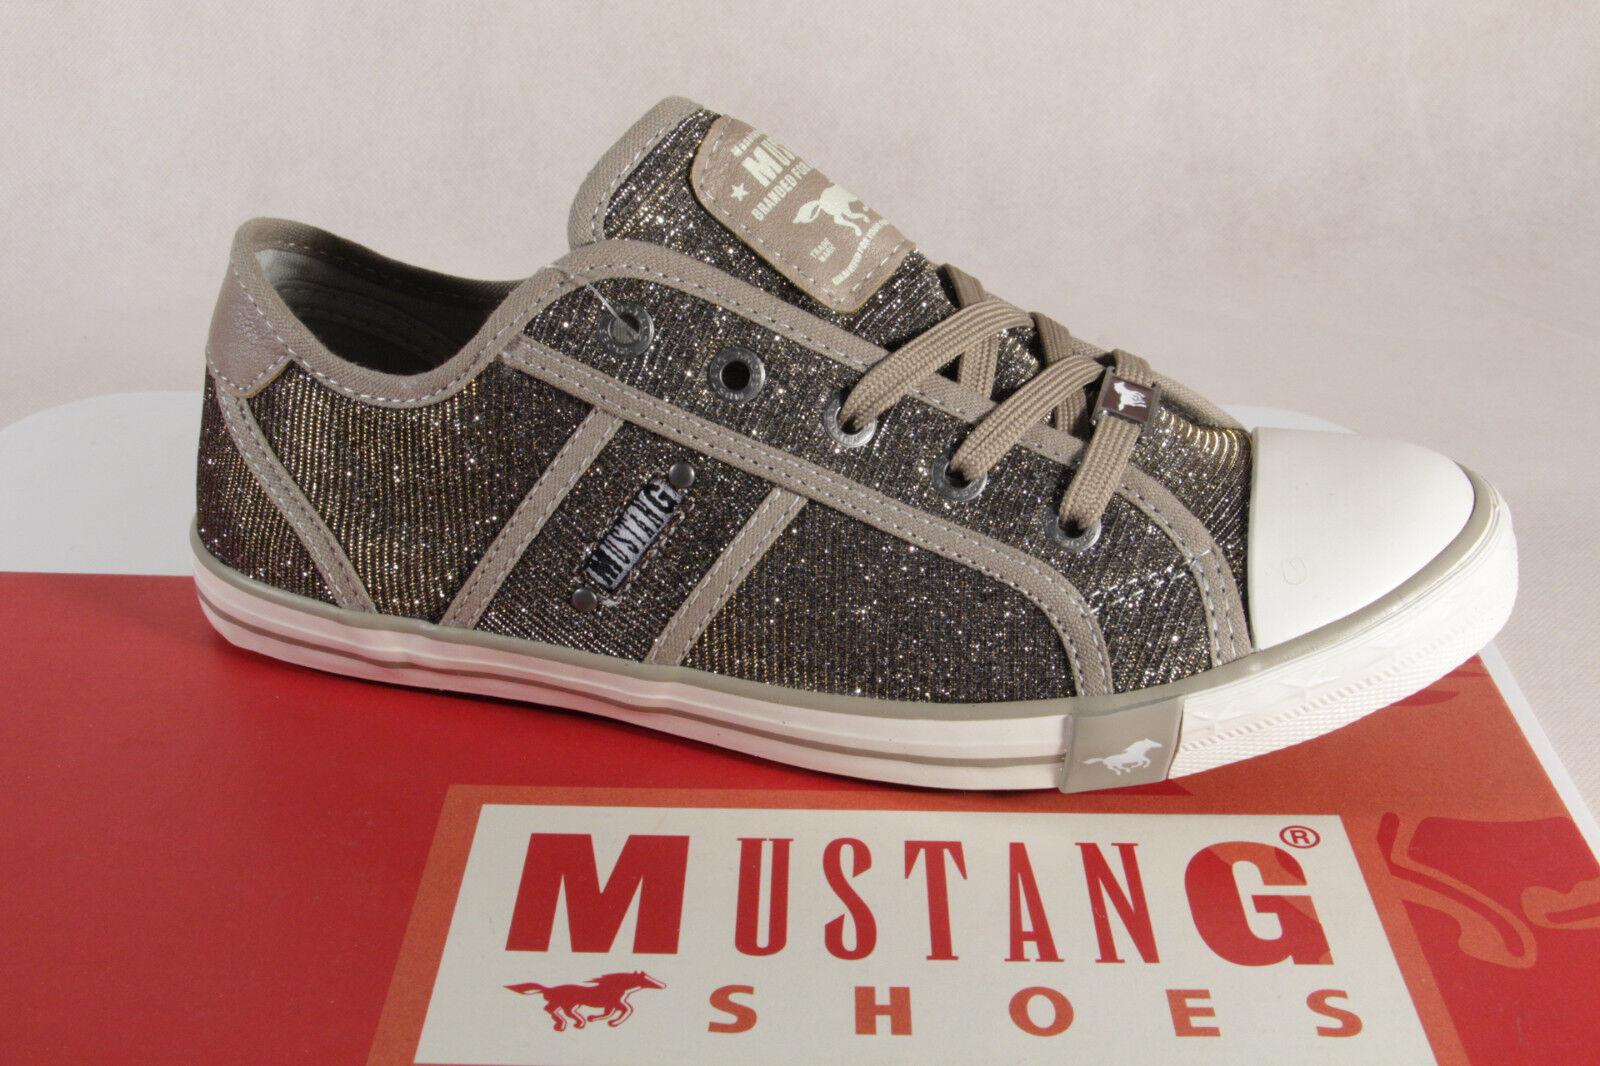 Mustang Chaussures Sport Chaussures à Lacets Basses Doré Textile Neuf